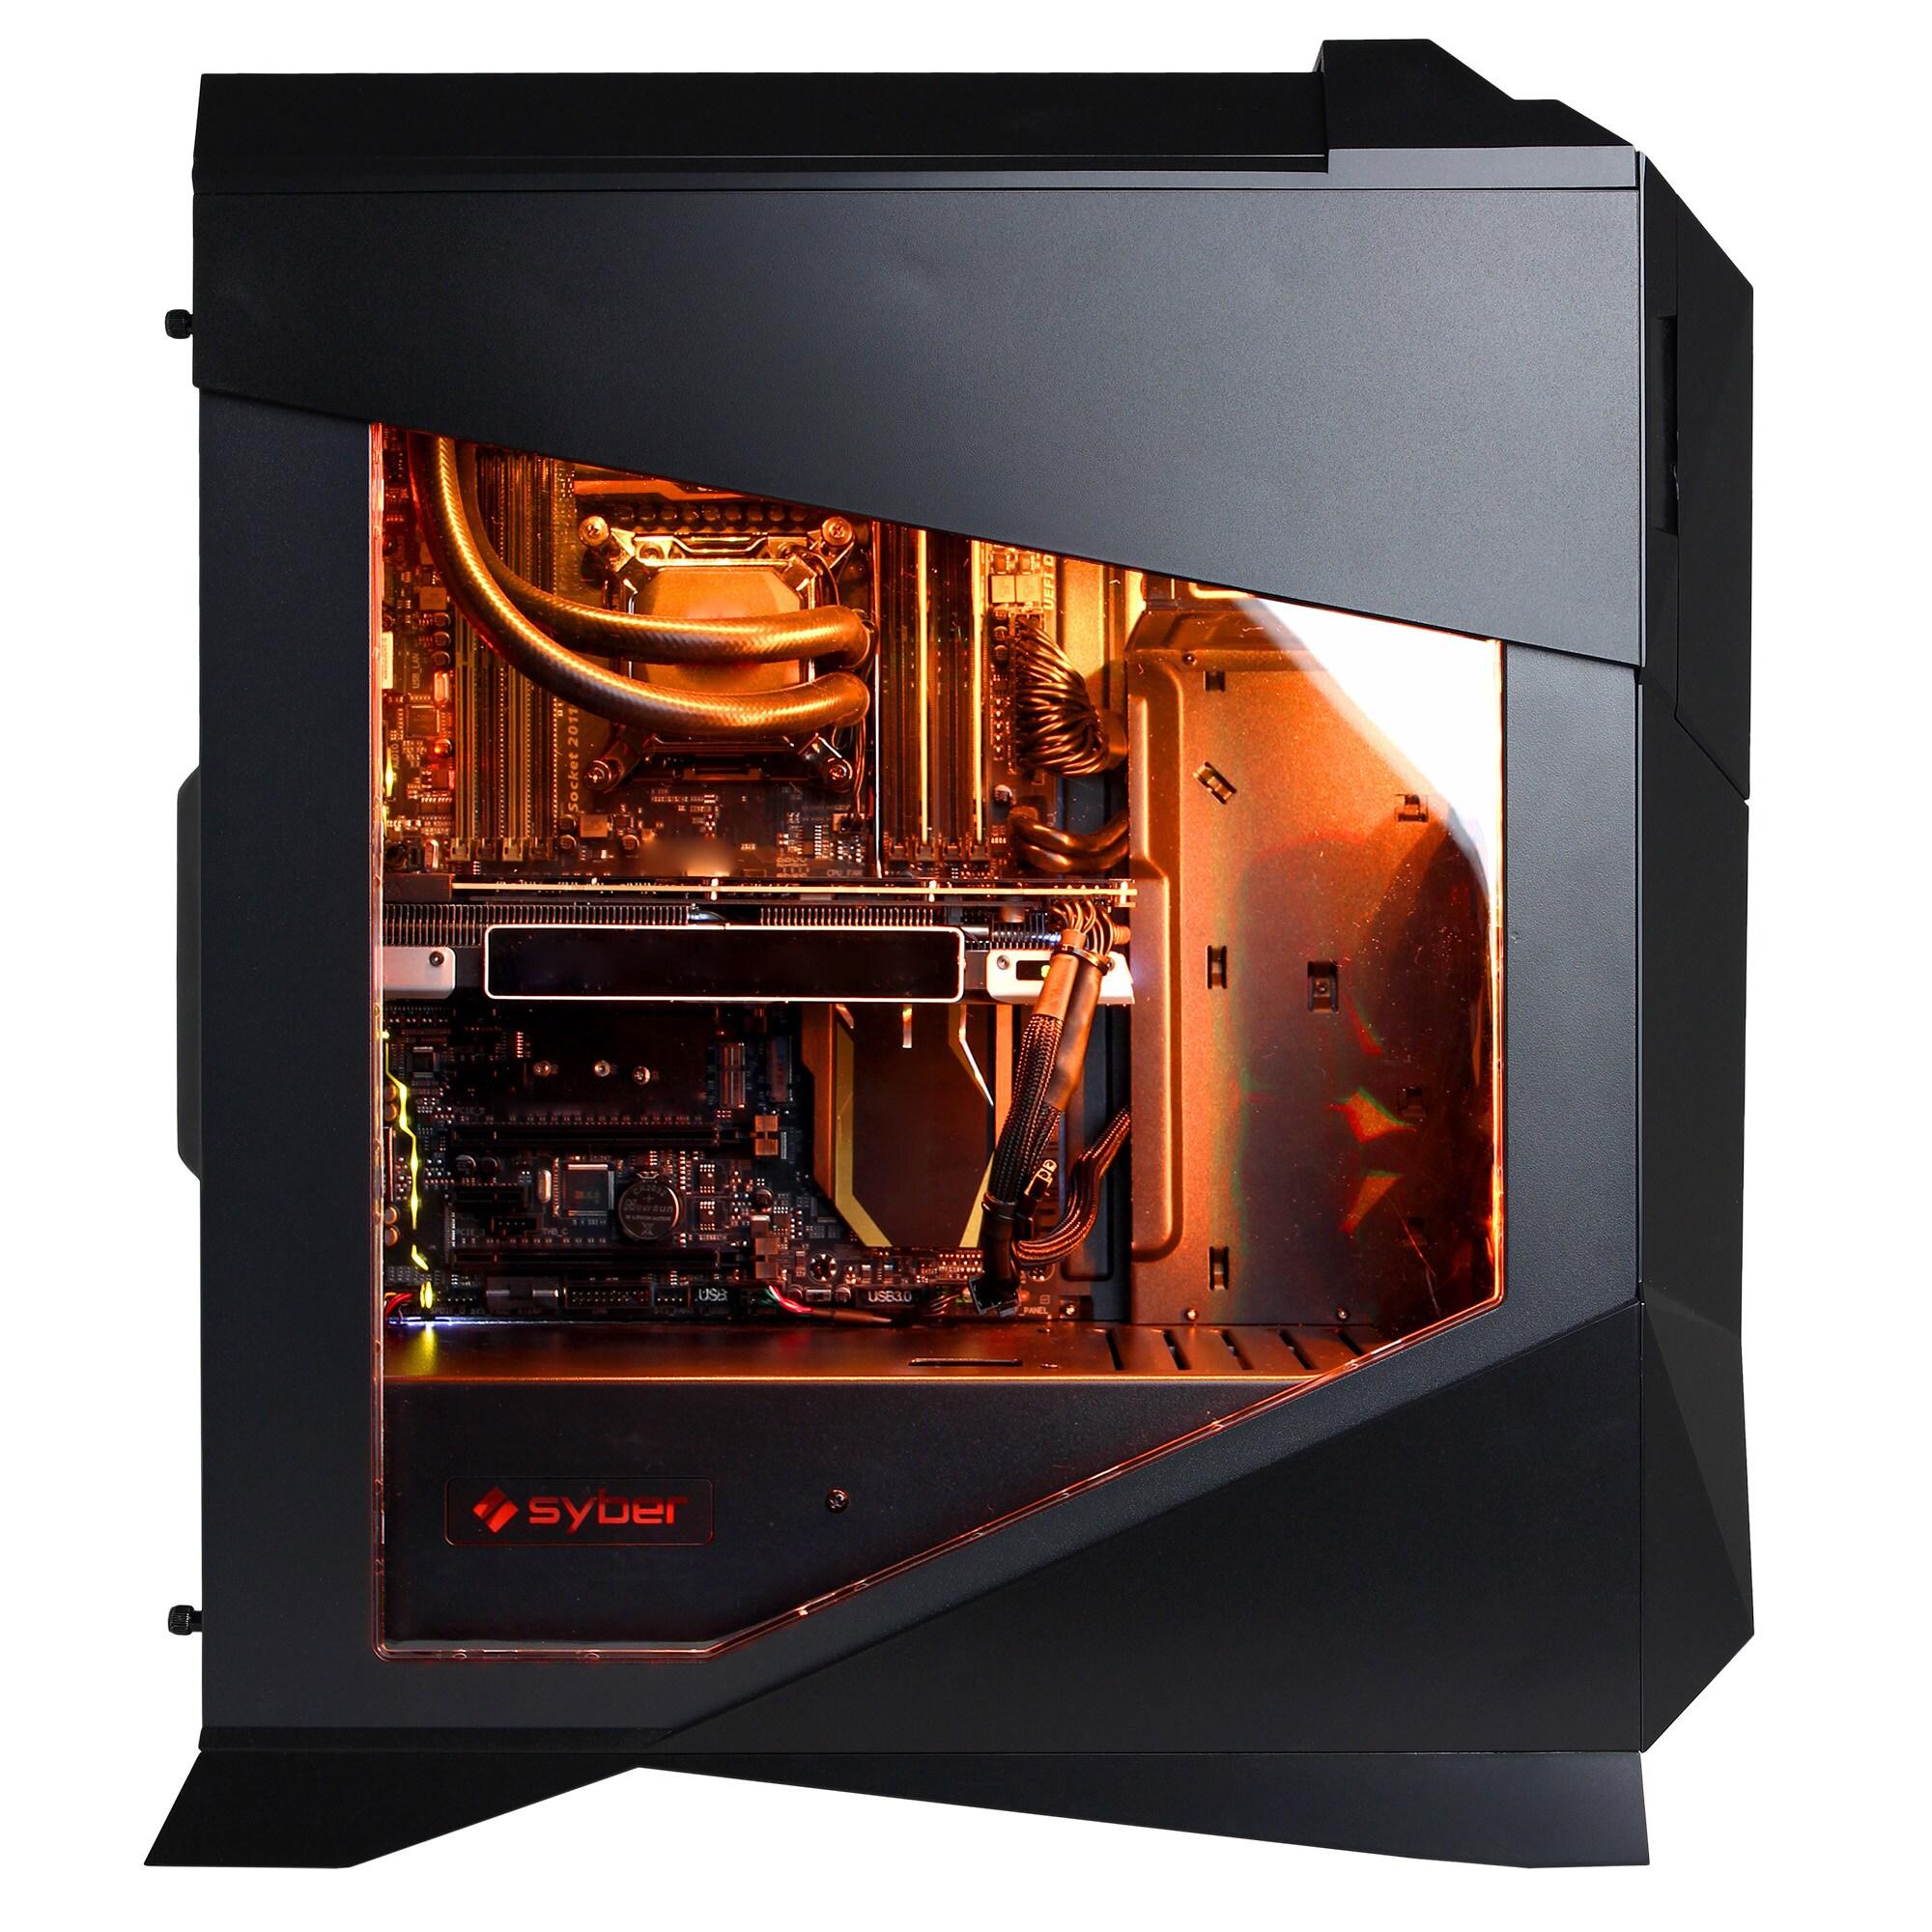 Syber M SMVR300LQ With Intel i7-6700K 4 0-gigahertz Gaming Computer